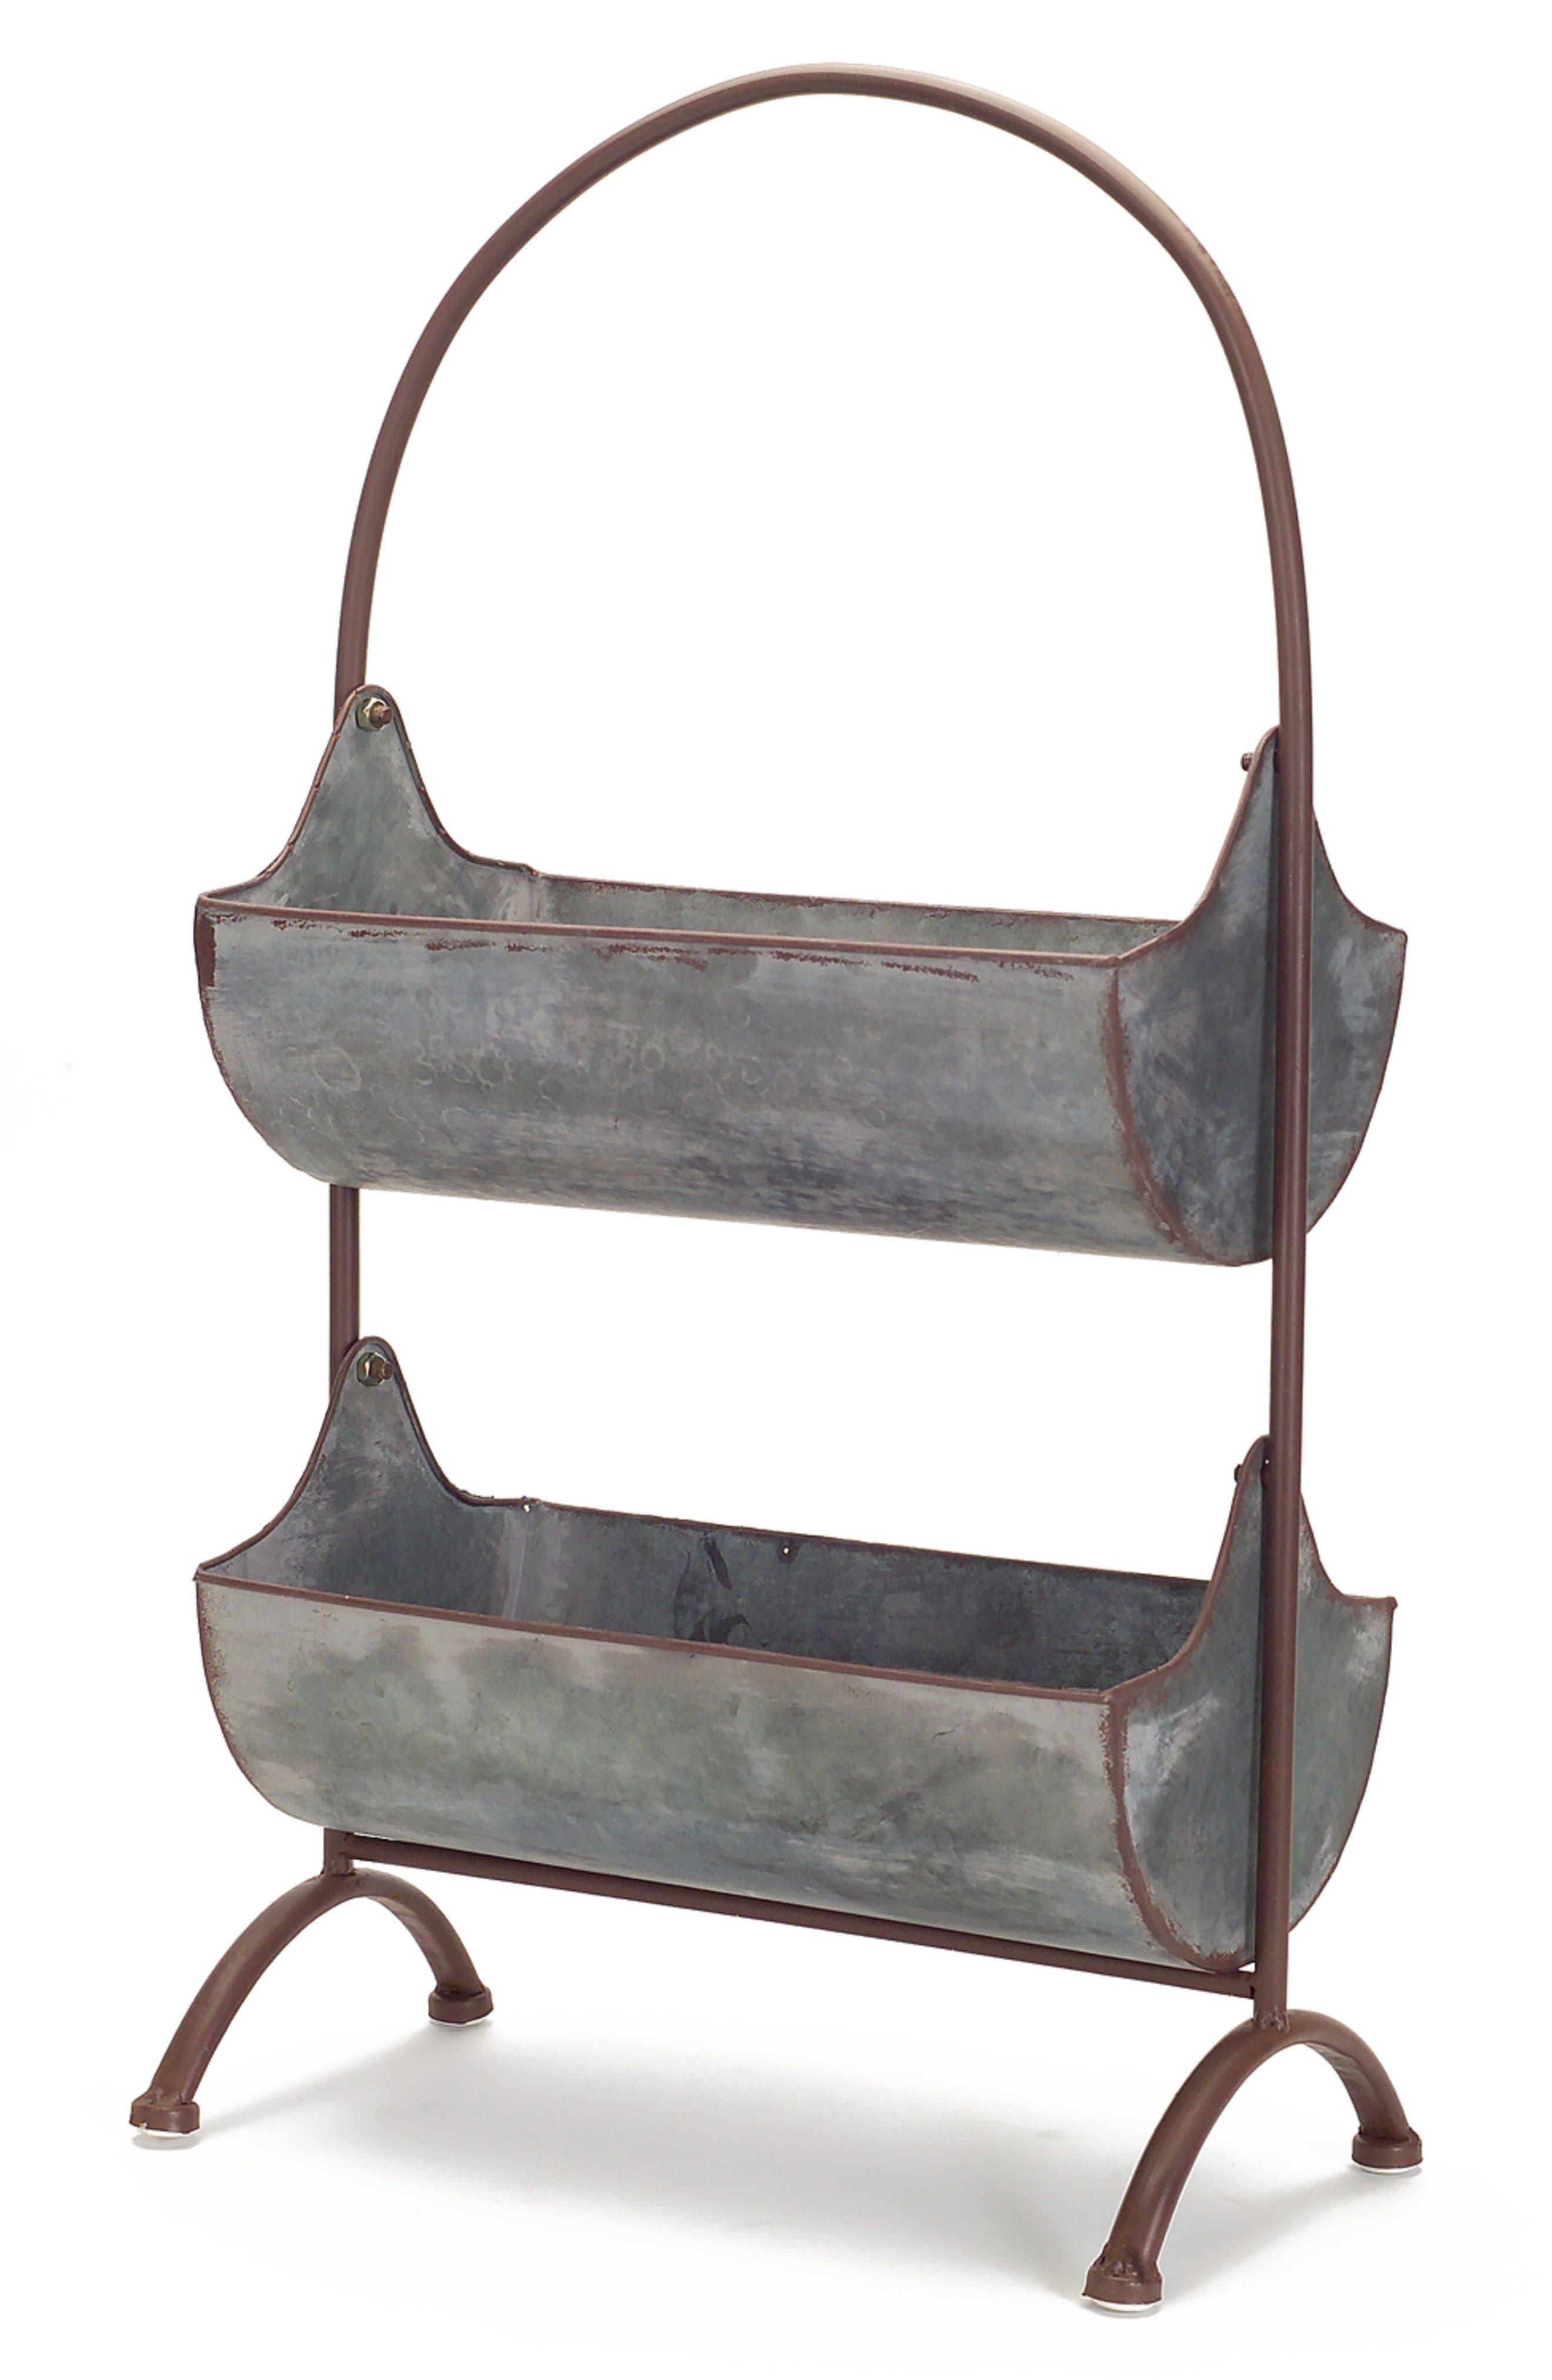 Hanging Baskets Stand,                             Main thumbnail 1, color,                             020